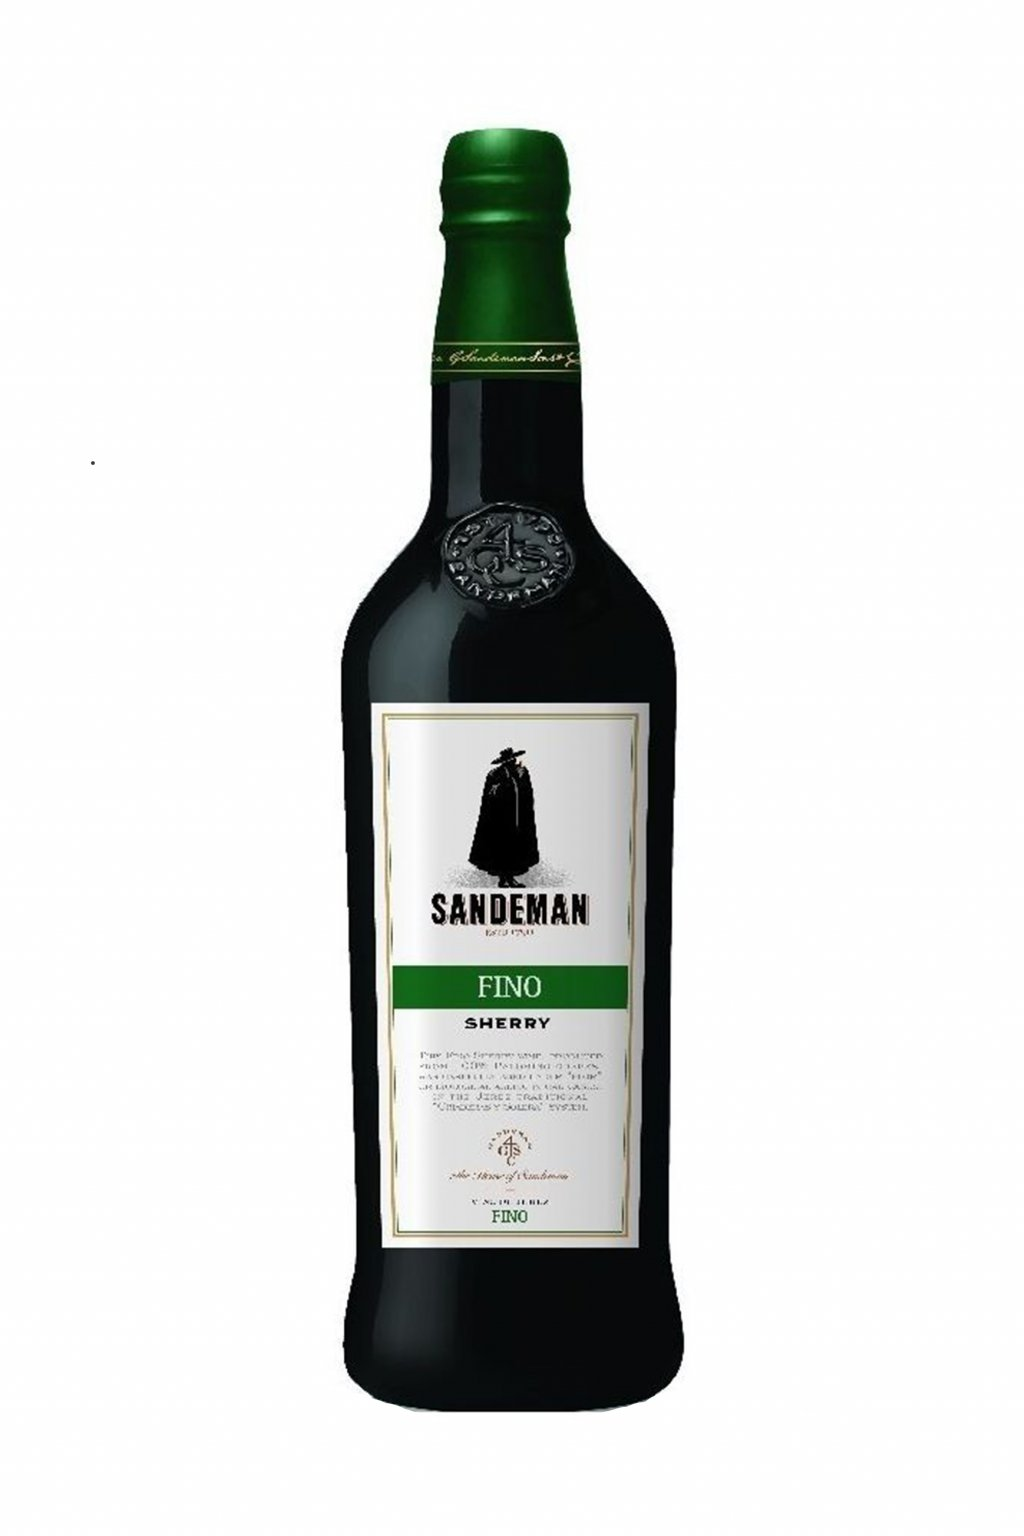 Sandeman sherry seco